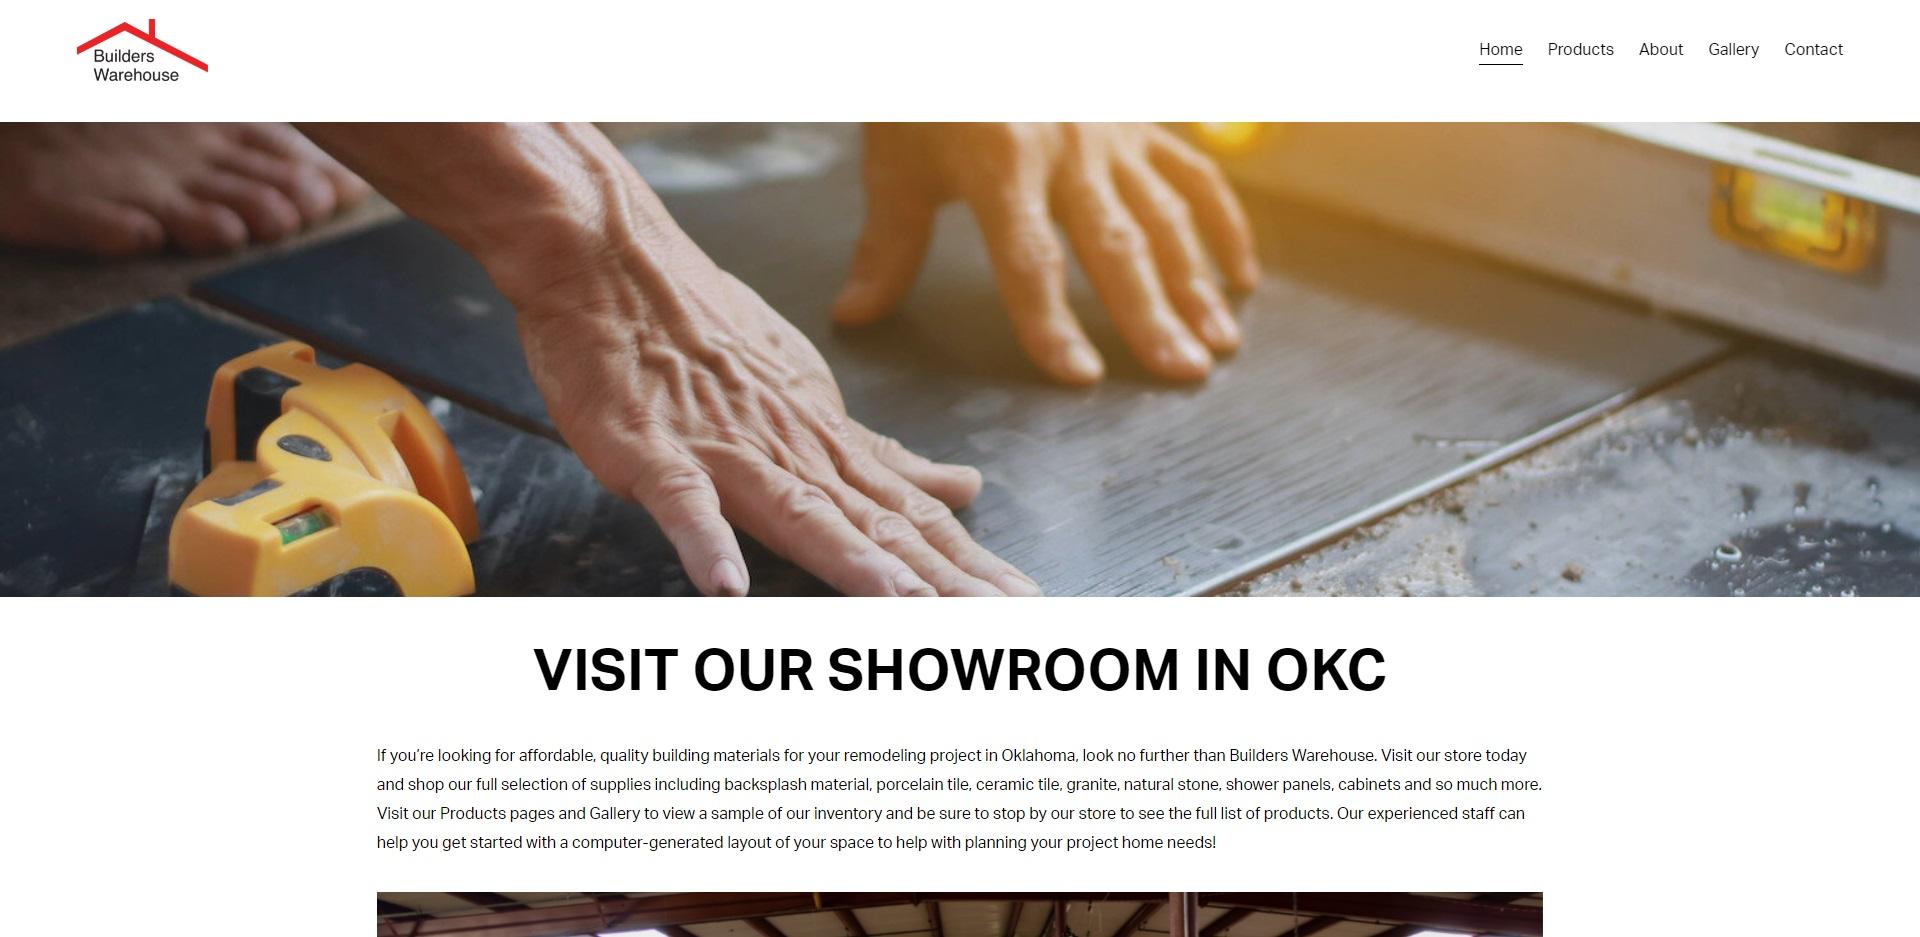 Best Bathroom Supplies in Oklahoma City, OK